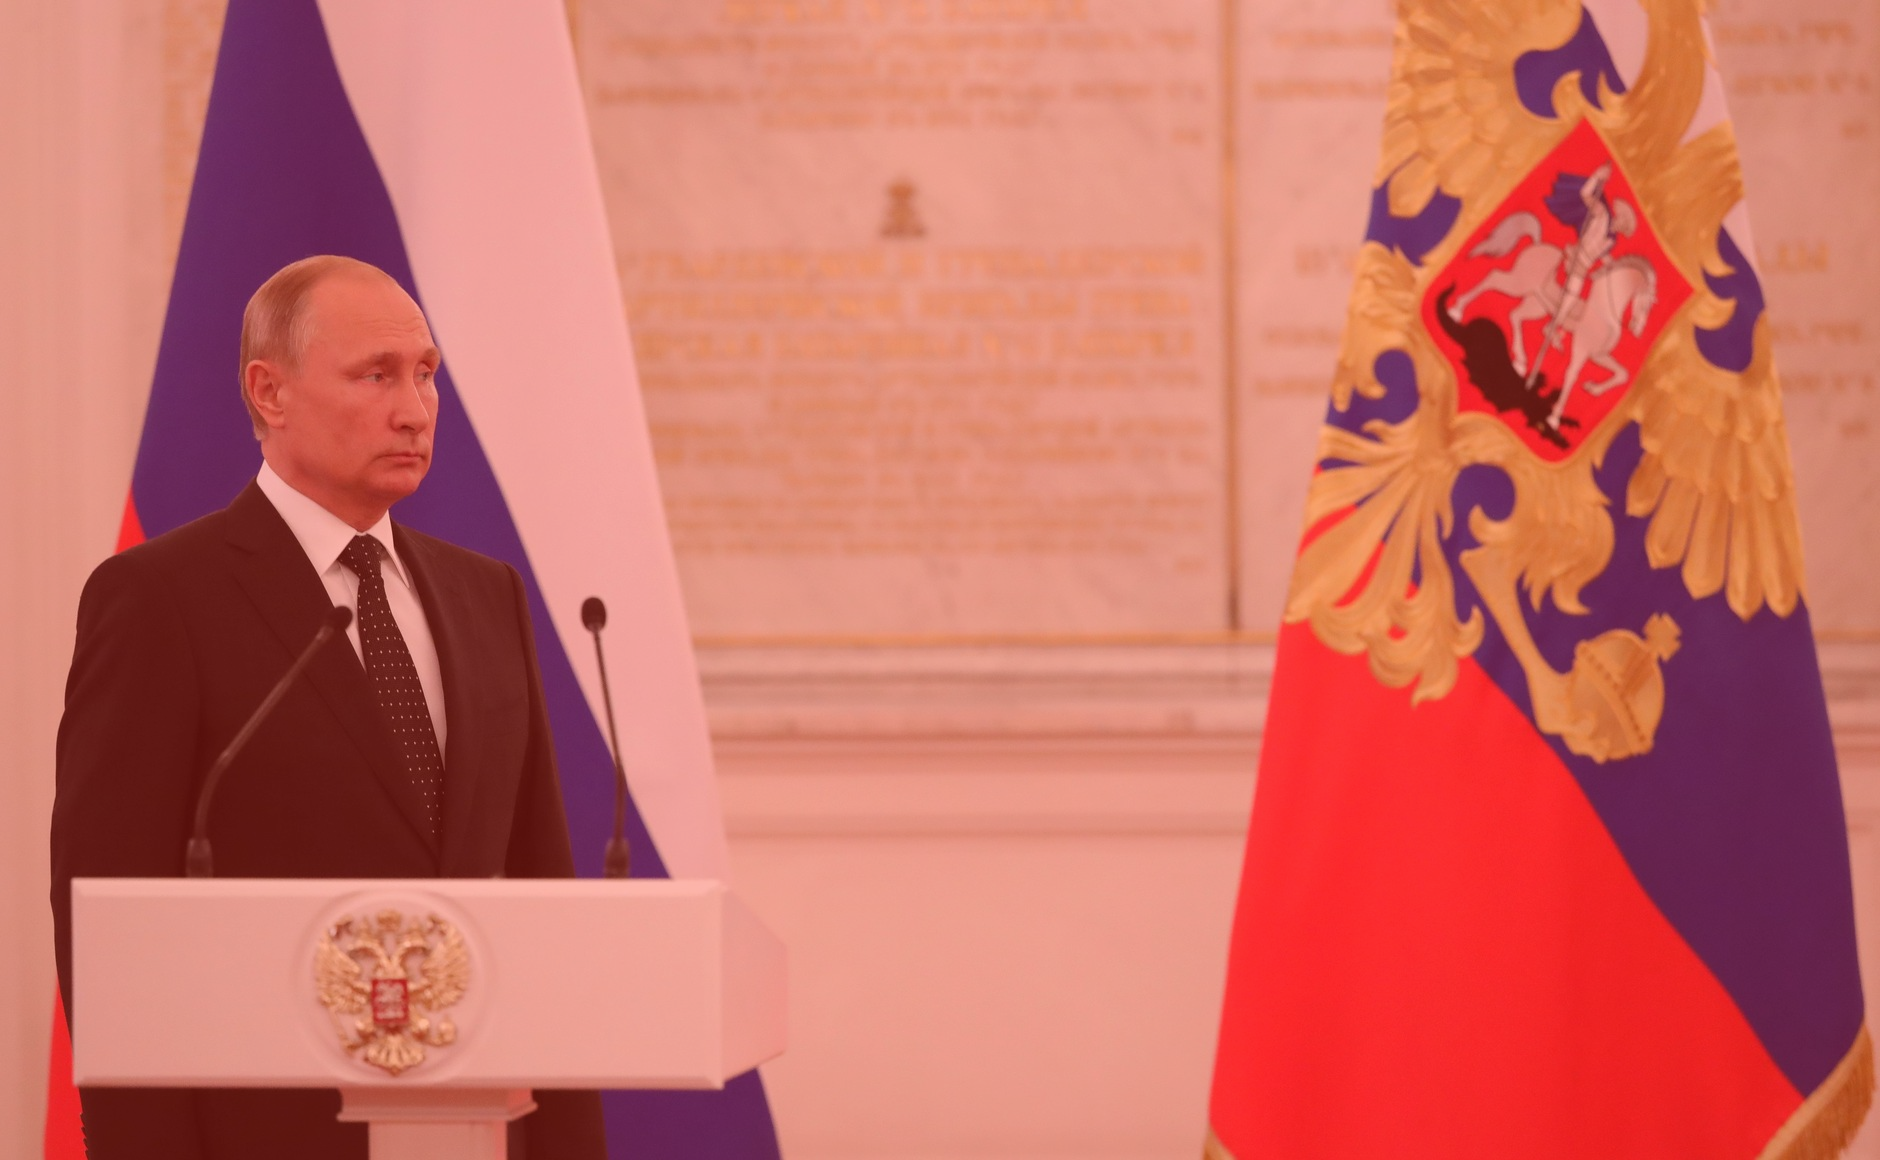 Dmitry Shlapentokh – Putin as Renaissance Ruler